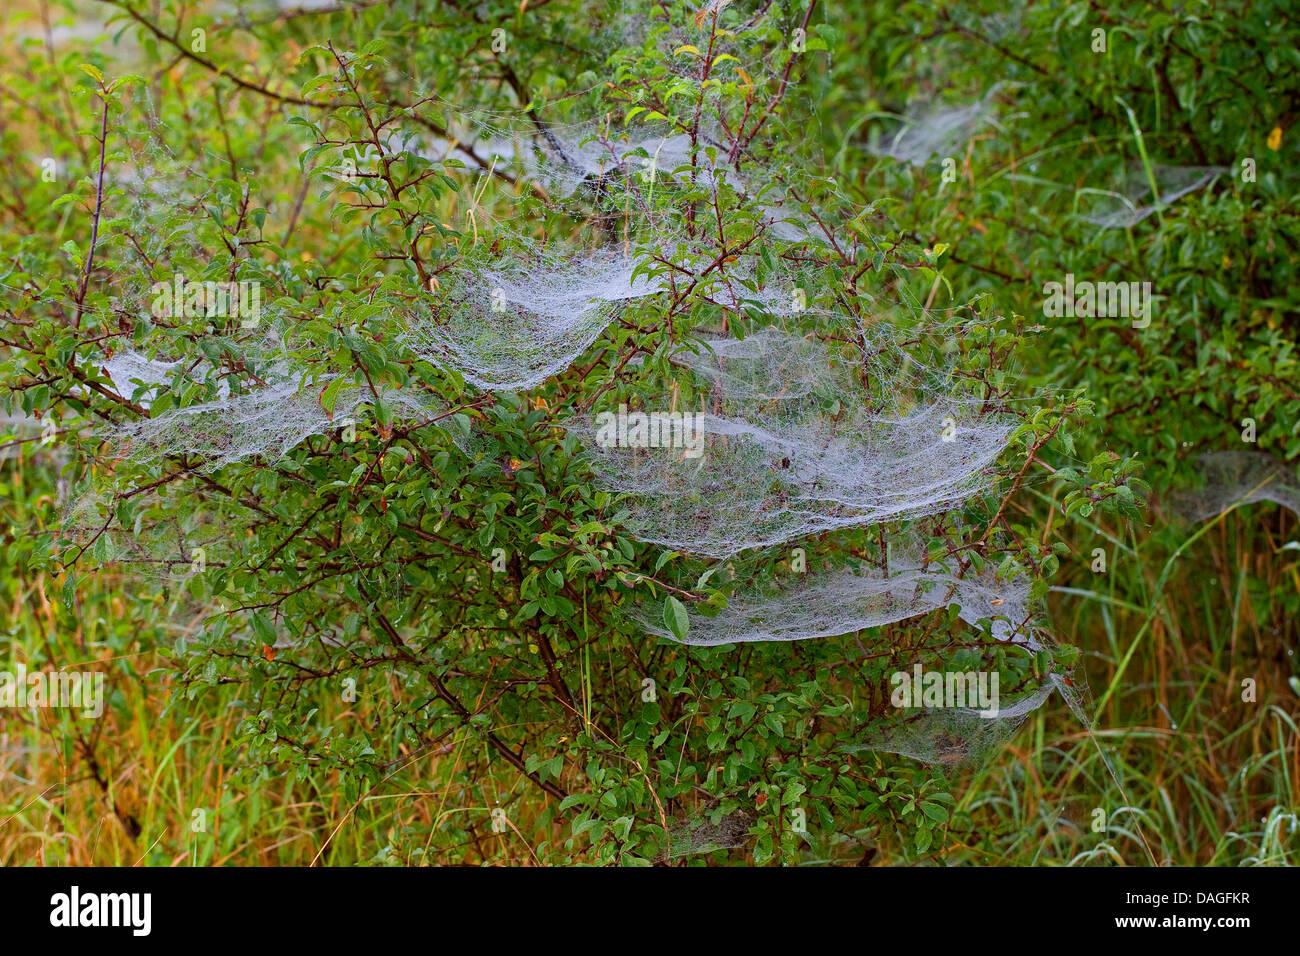 Feuilles-web weaver, tissage de ligne Ligne, araignée Linyphia triangularis (Weaver), Manu Chao avec morningdew, Photo Stock